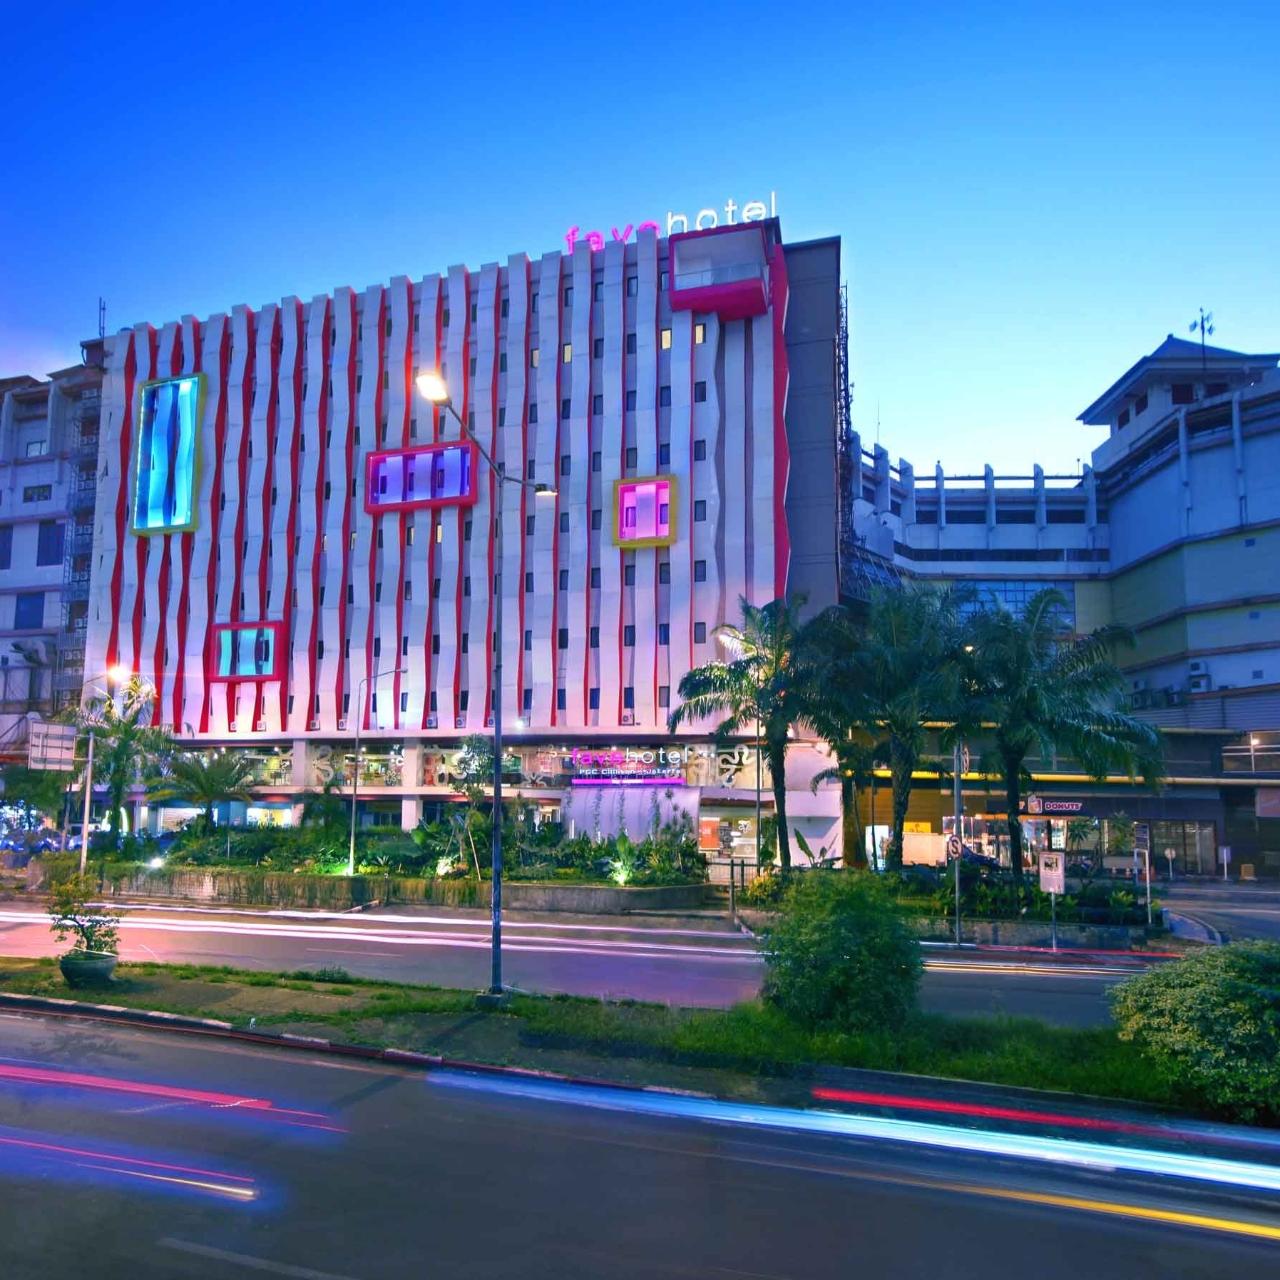 Favehotel Pgc Cililitan In Jakarta Hrs